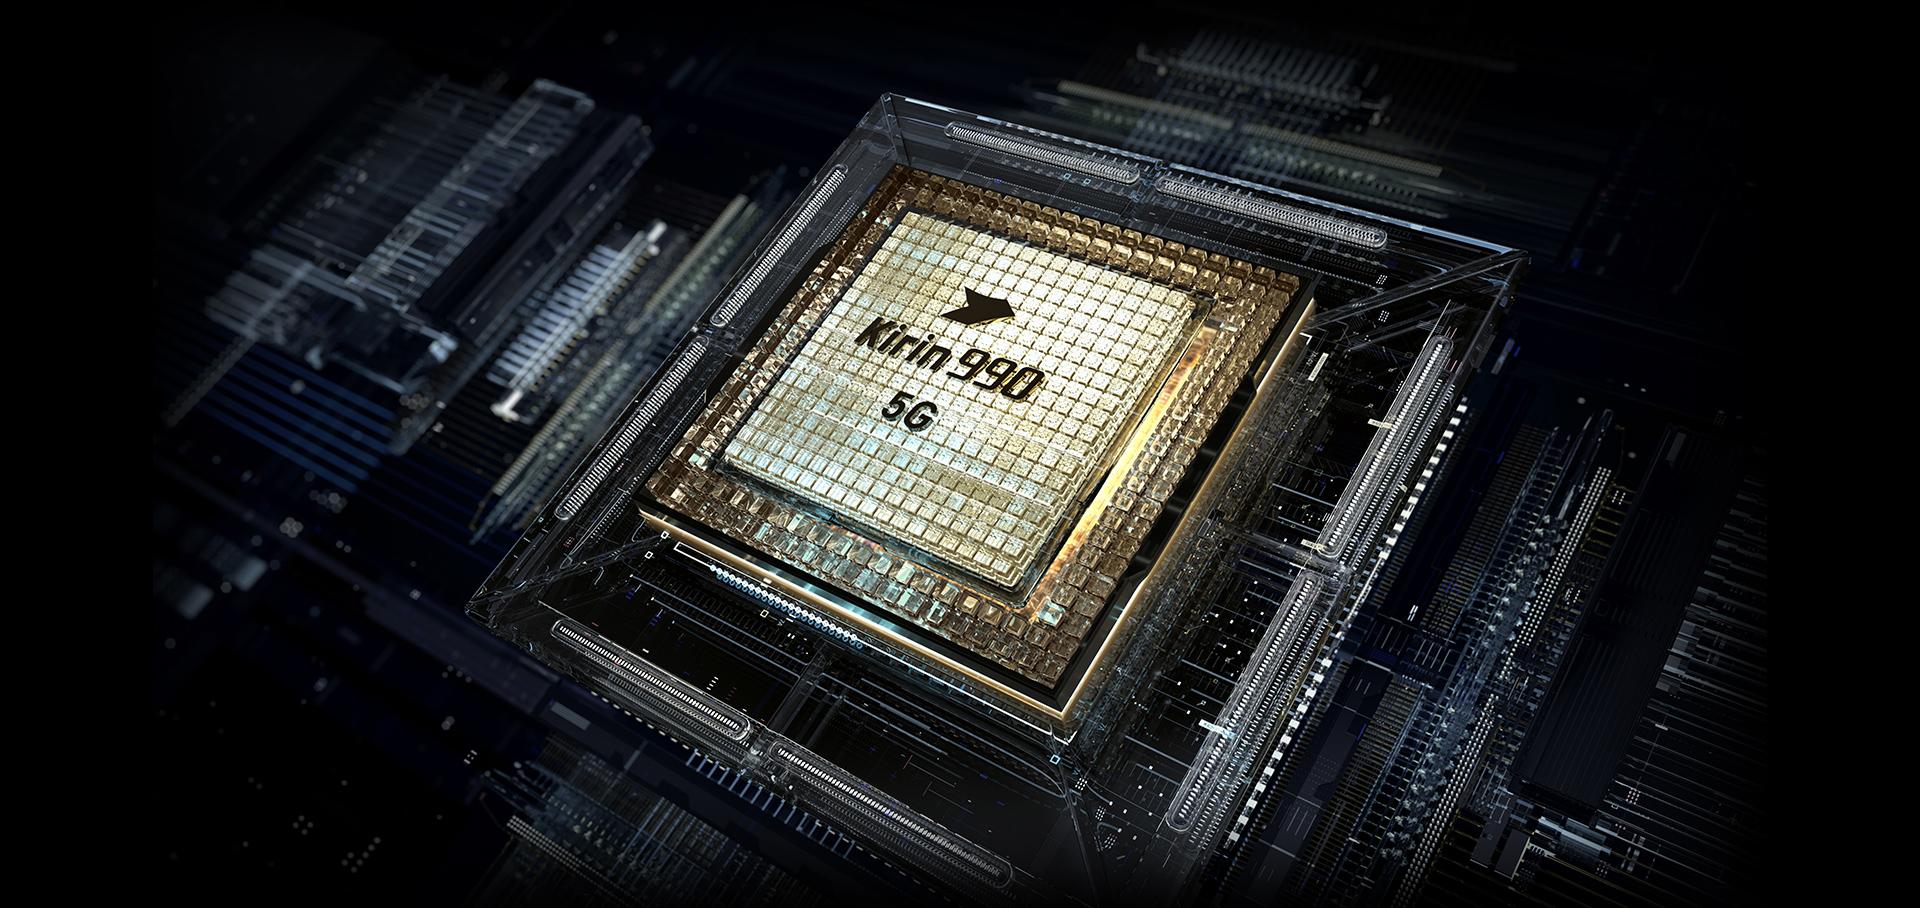 porsche-design-huawei-mate-30-rs-5G-chipset-experience